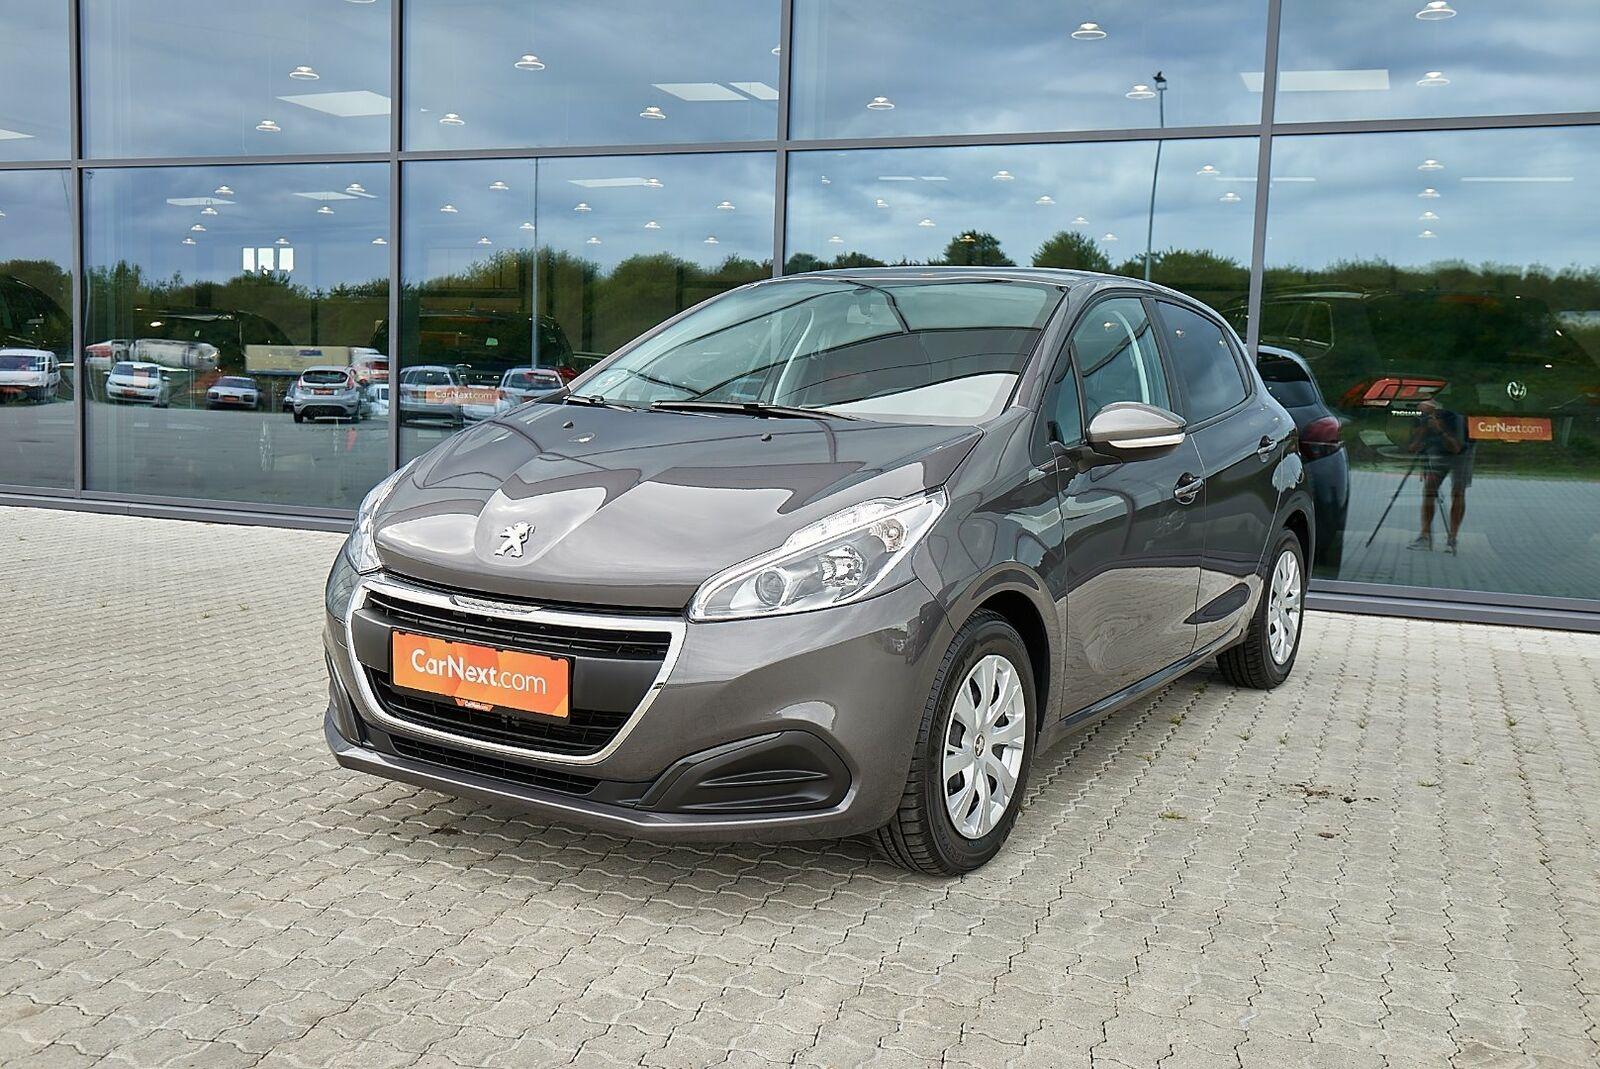 Peugeot 208 1,2 PT 82 Envy 5d - 109.900 kr.